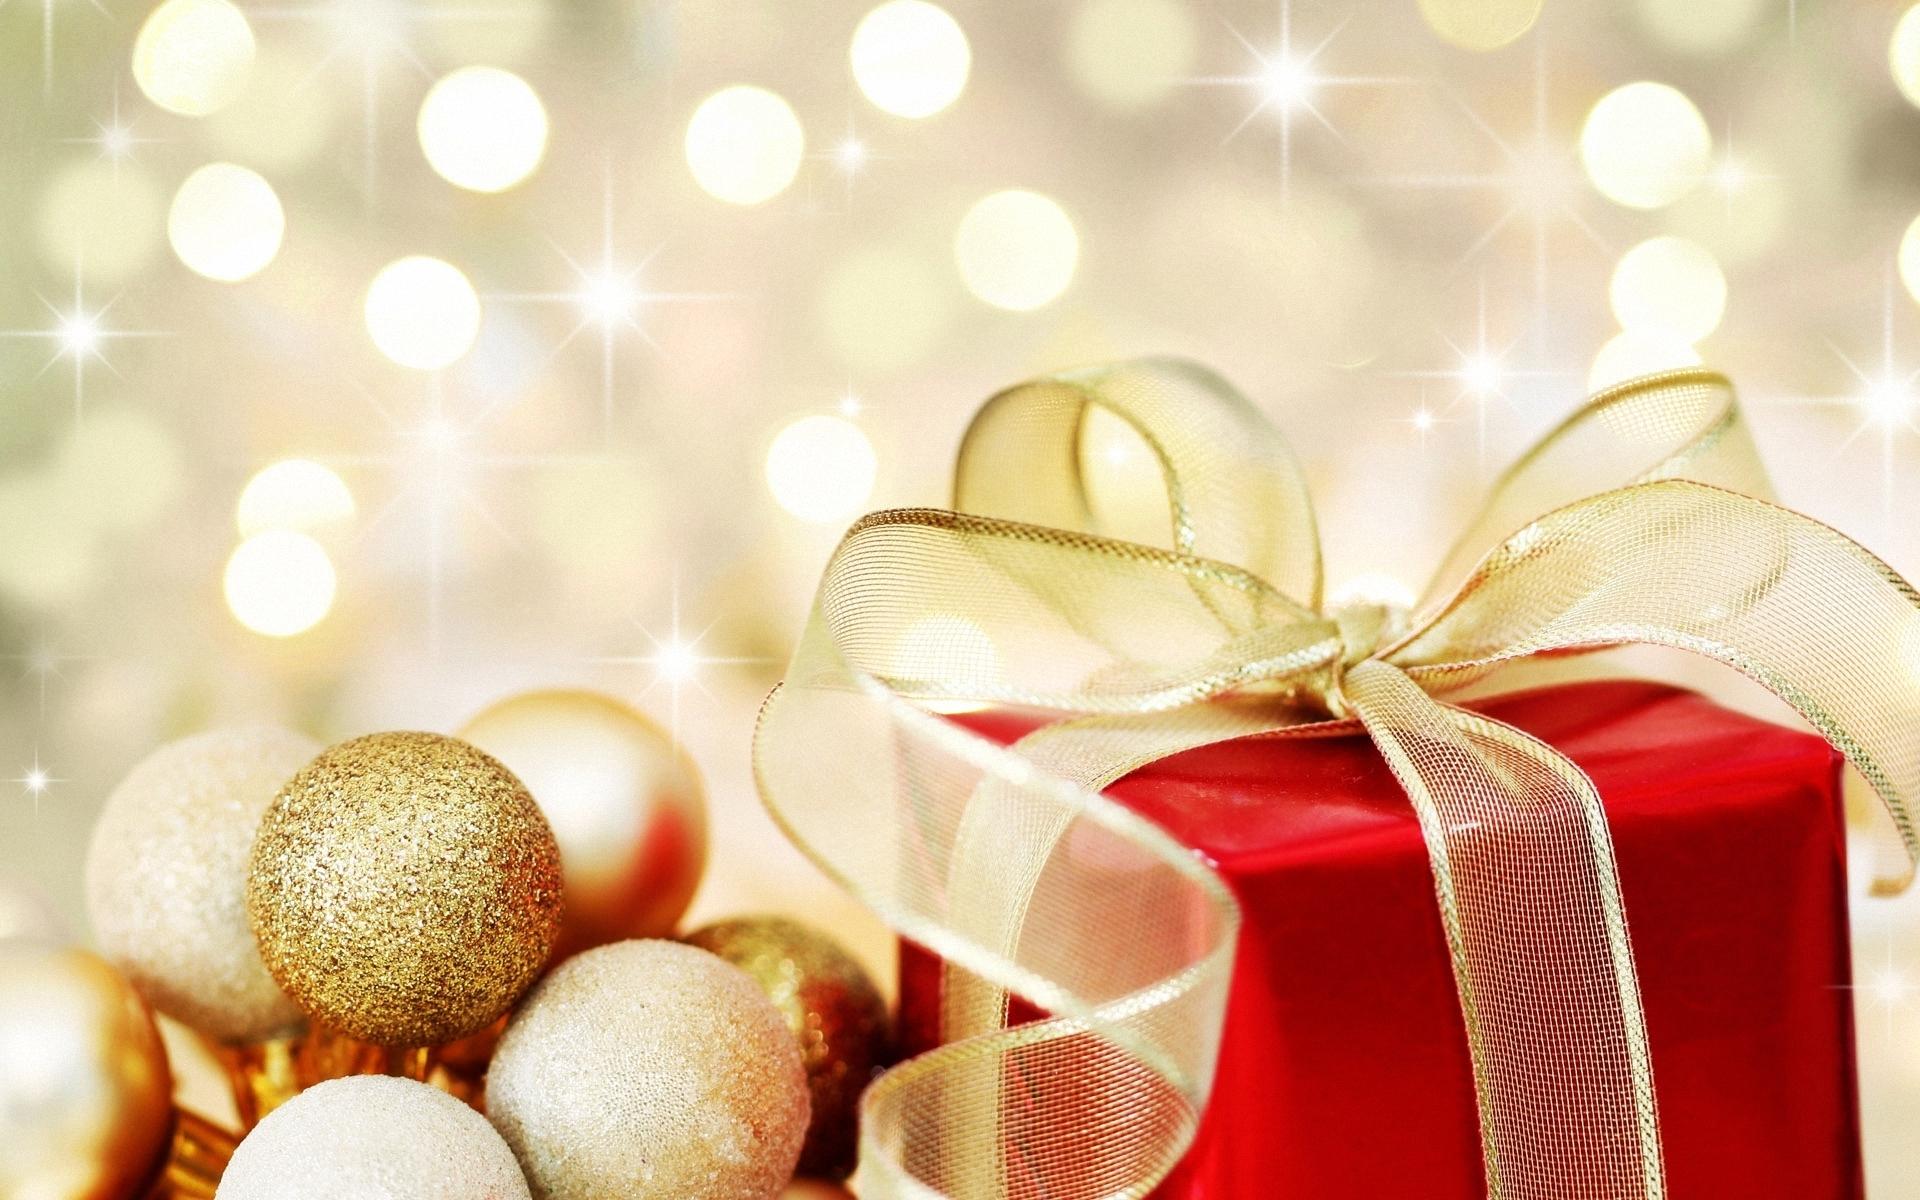 Christmas images Golden Christmas ornaments wallpaper photos 22229803 1920x1200